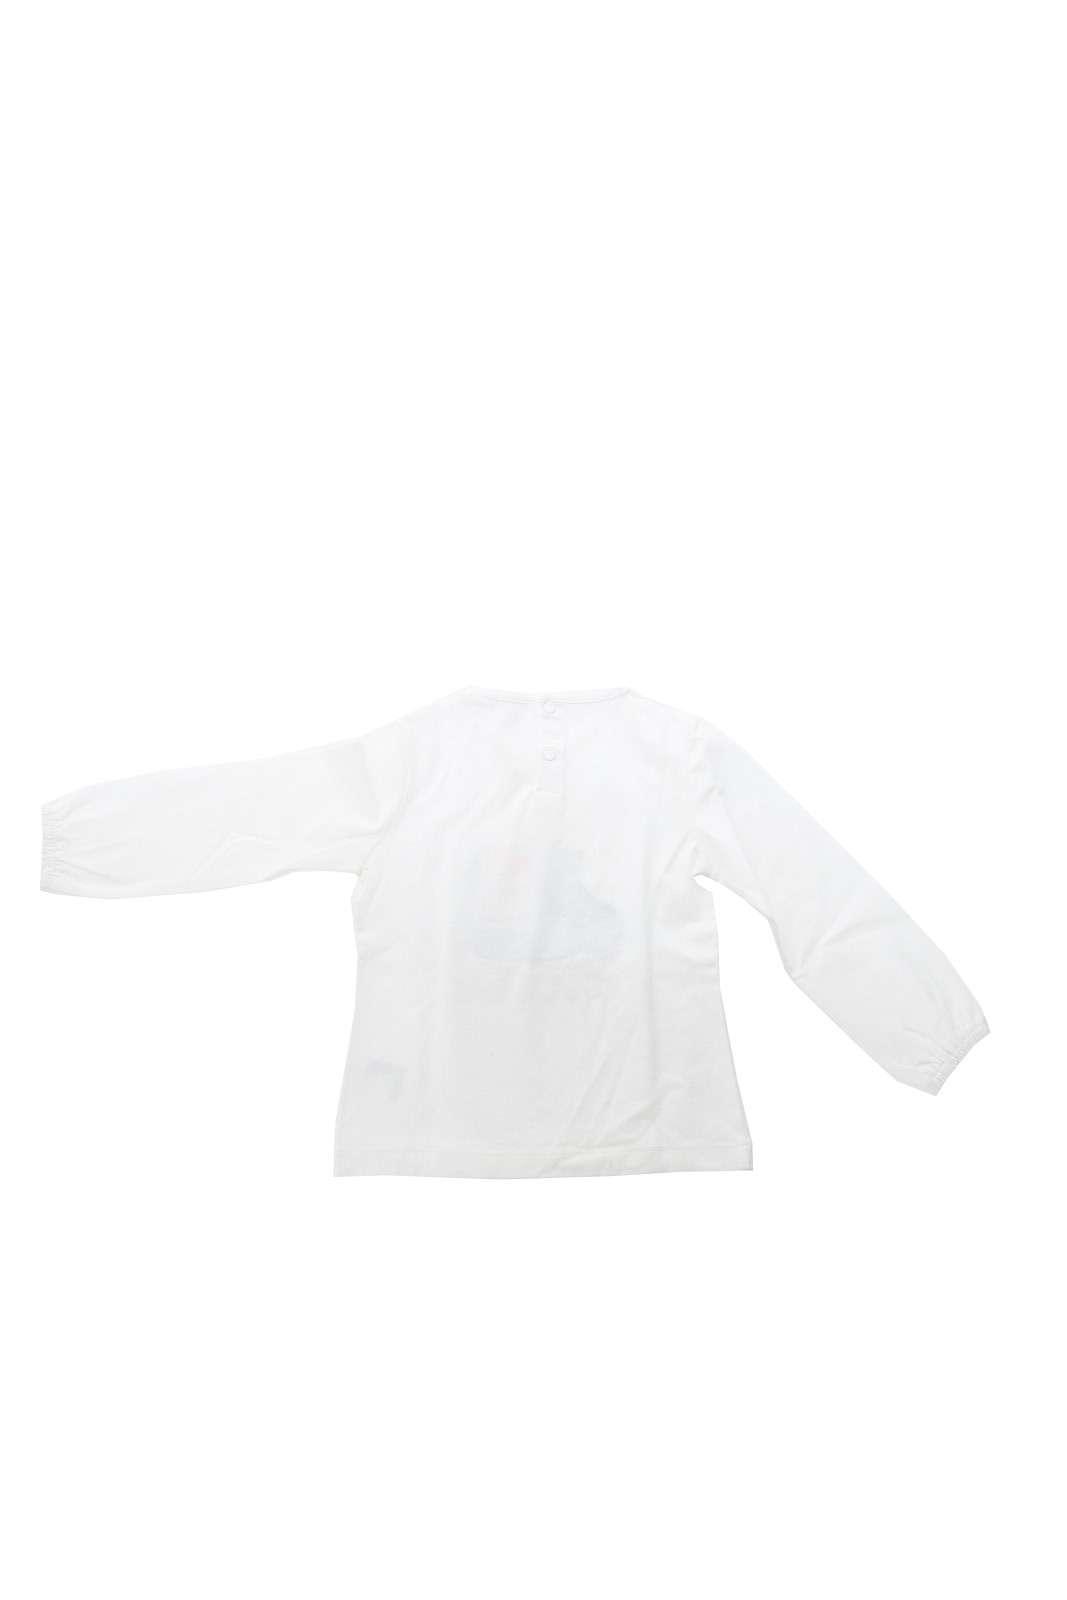 https://www.parmax.com/media/catalog/product/a/i/PE-outlet_parmax-t-shirt-bambina-Silvian-Heach-NNDI5154TS-B.jpg